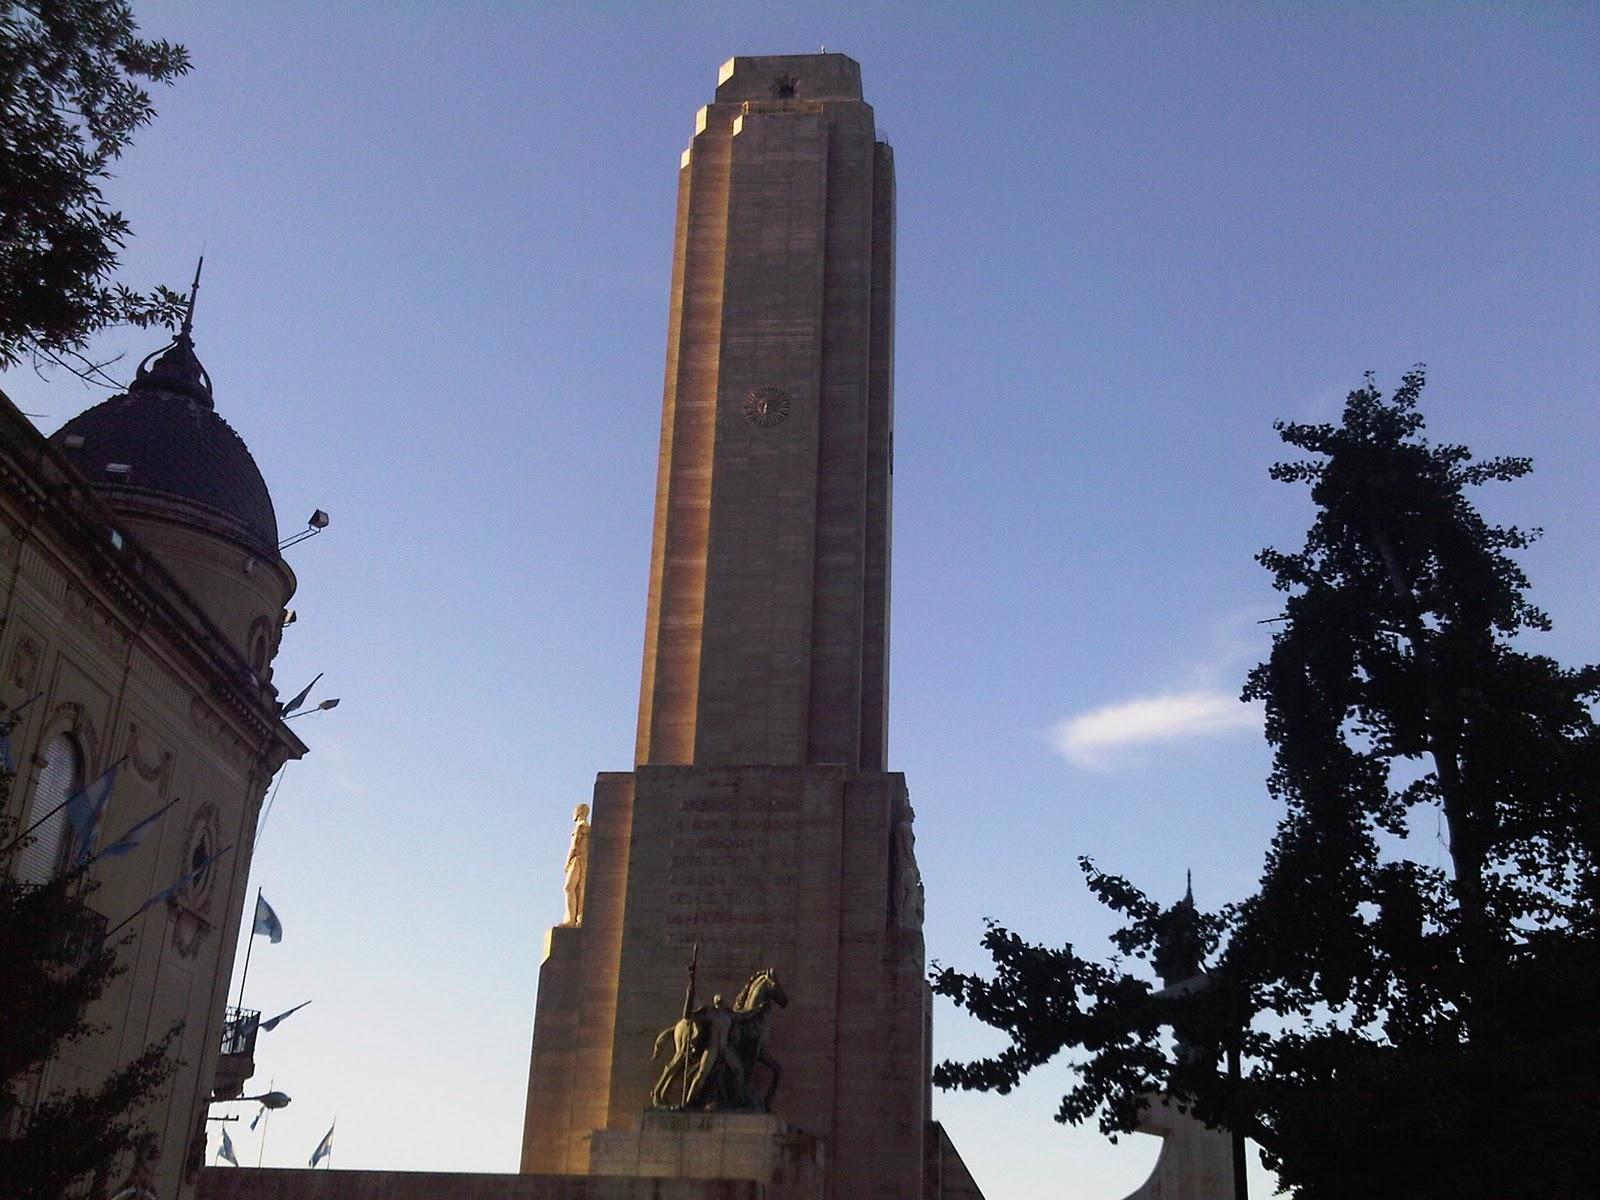 Rosario, Argentina, Elisa N, Blog de Viajes, Lifestyle, Travel